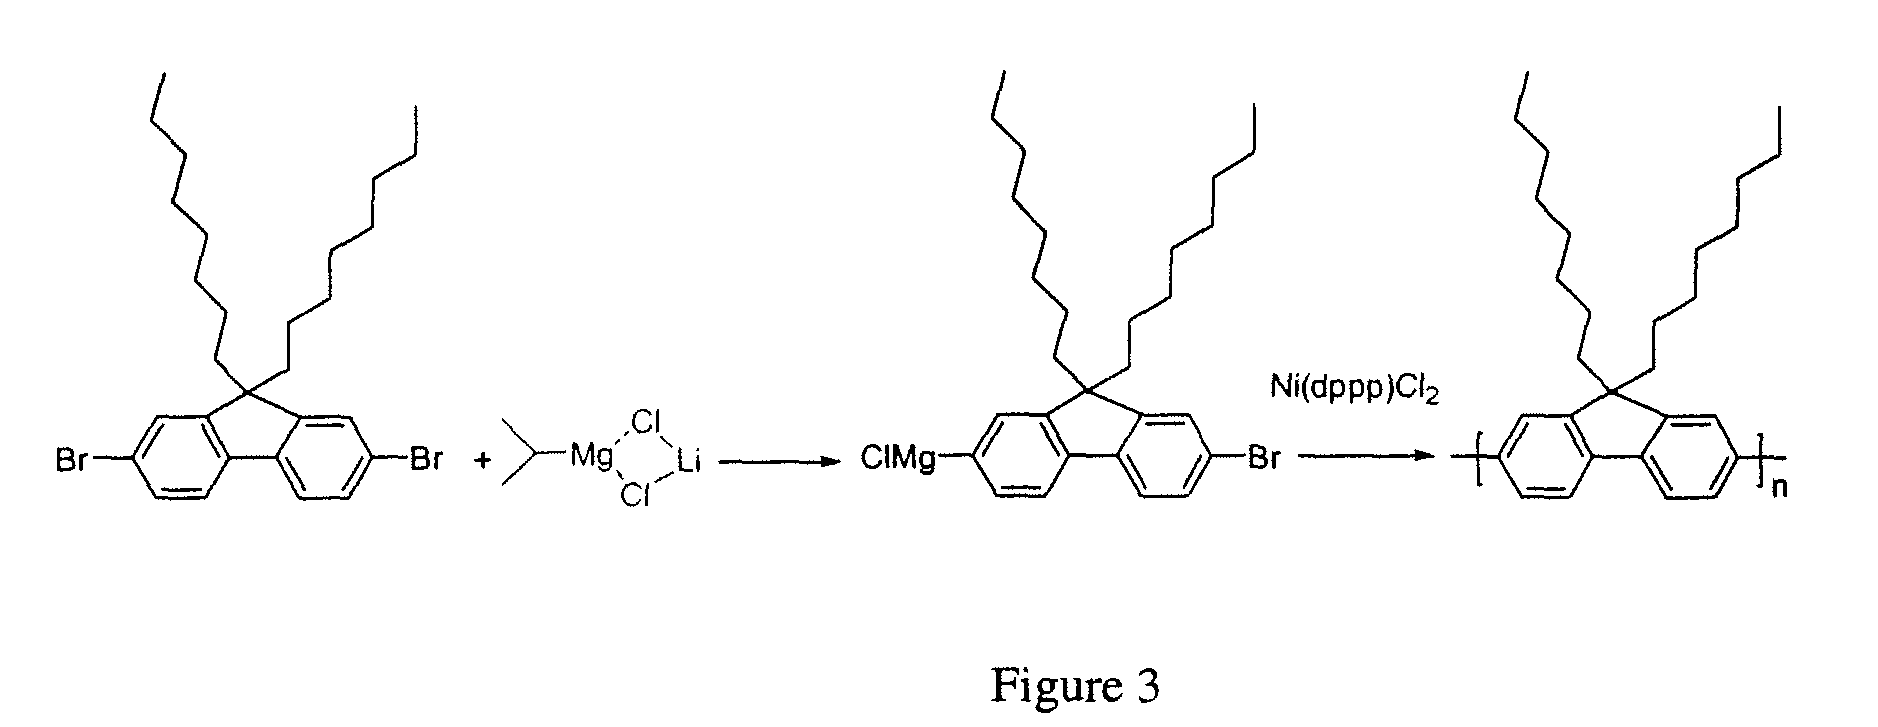 grignard metathesis reaction Communication nickel(ii) a-diimine catalyst for grignard metathesis (grim) polymerizationa harsha d magurudeniya, prakash sista, jacob k.